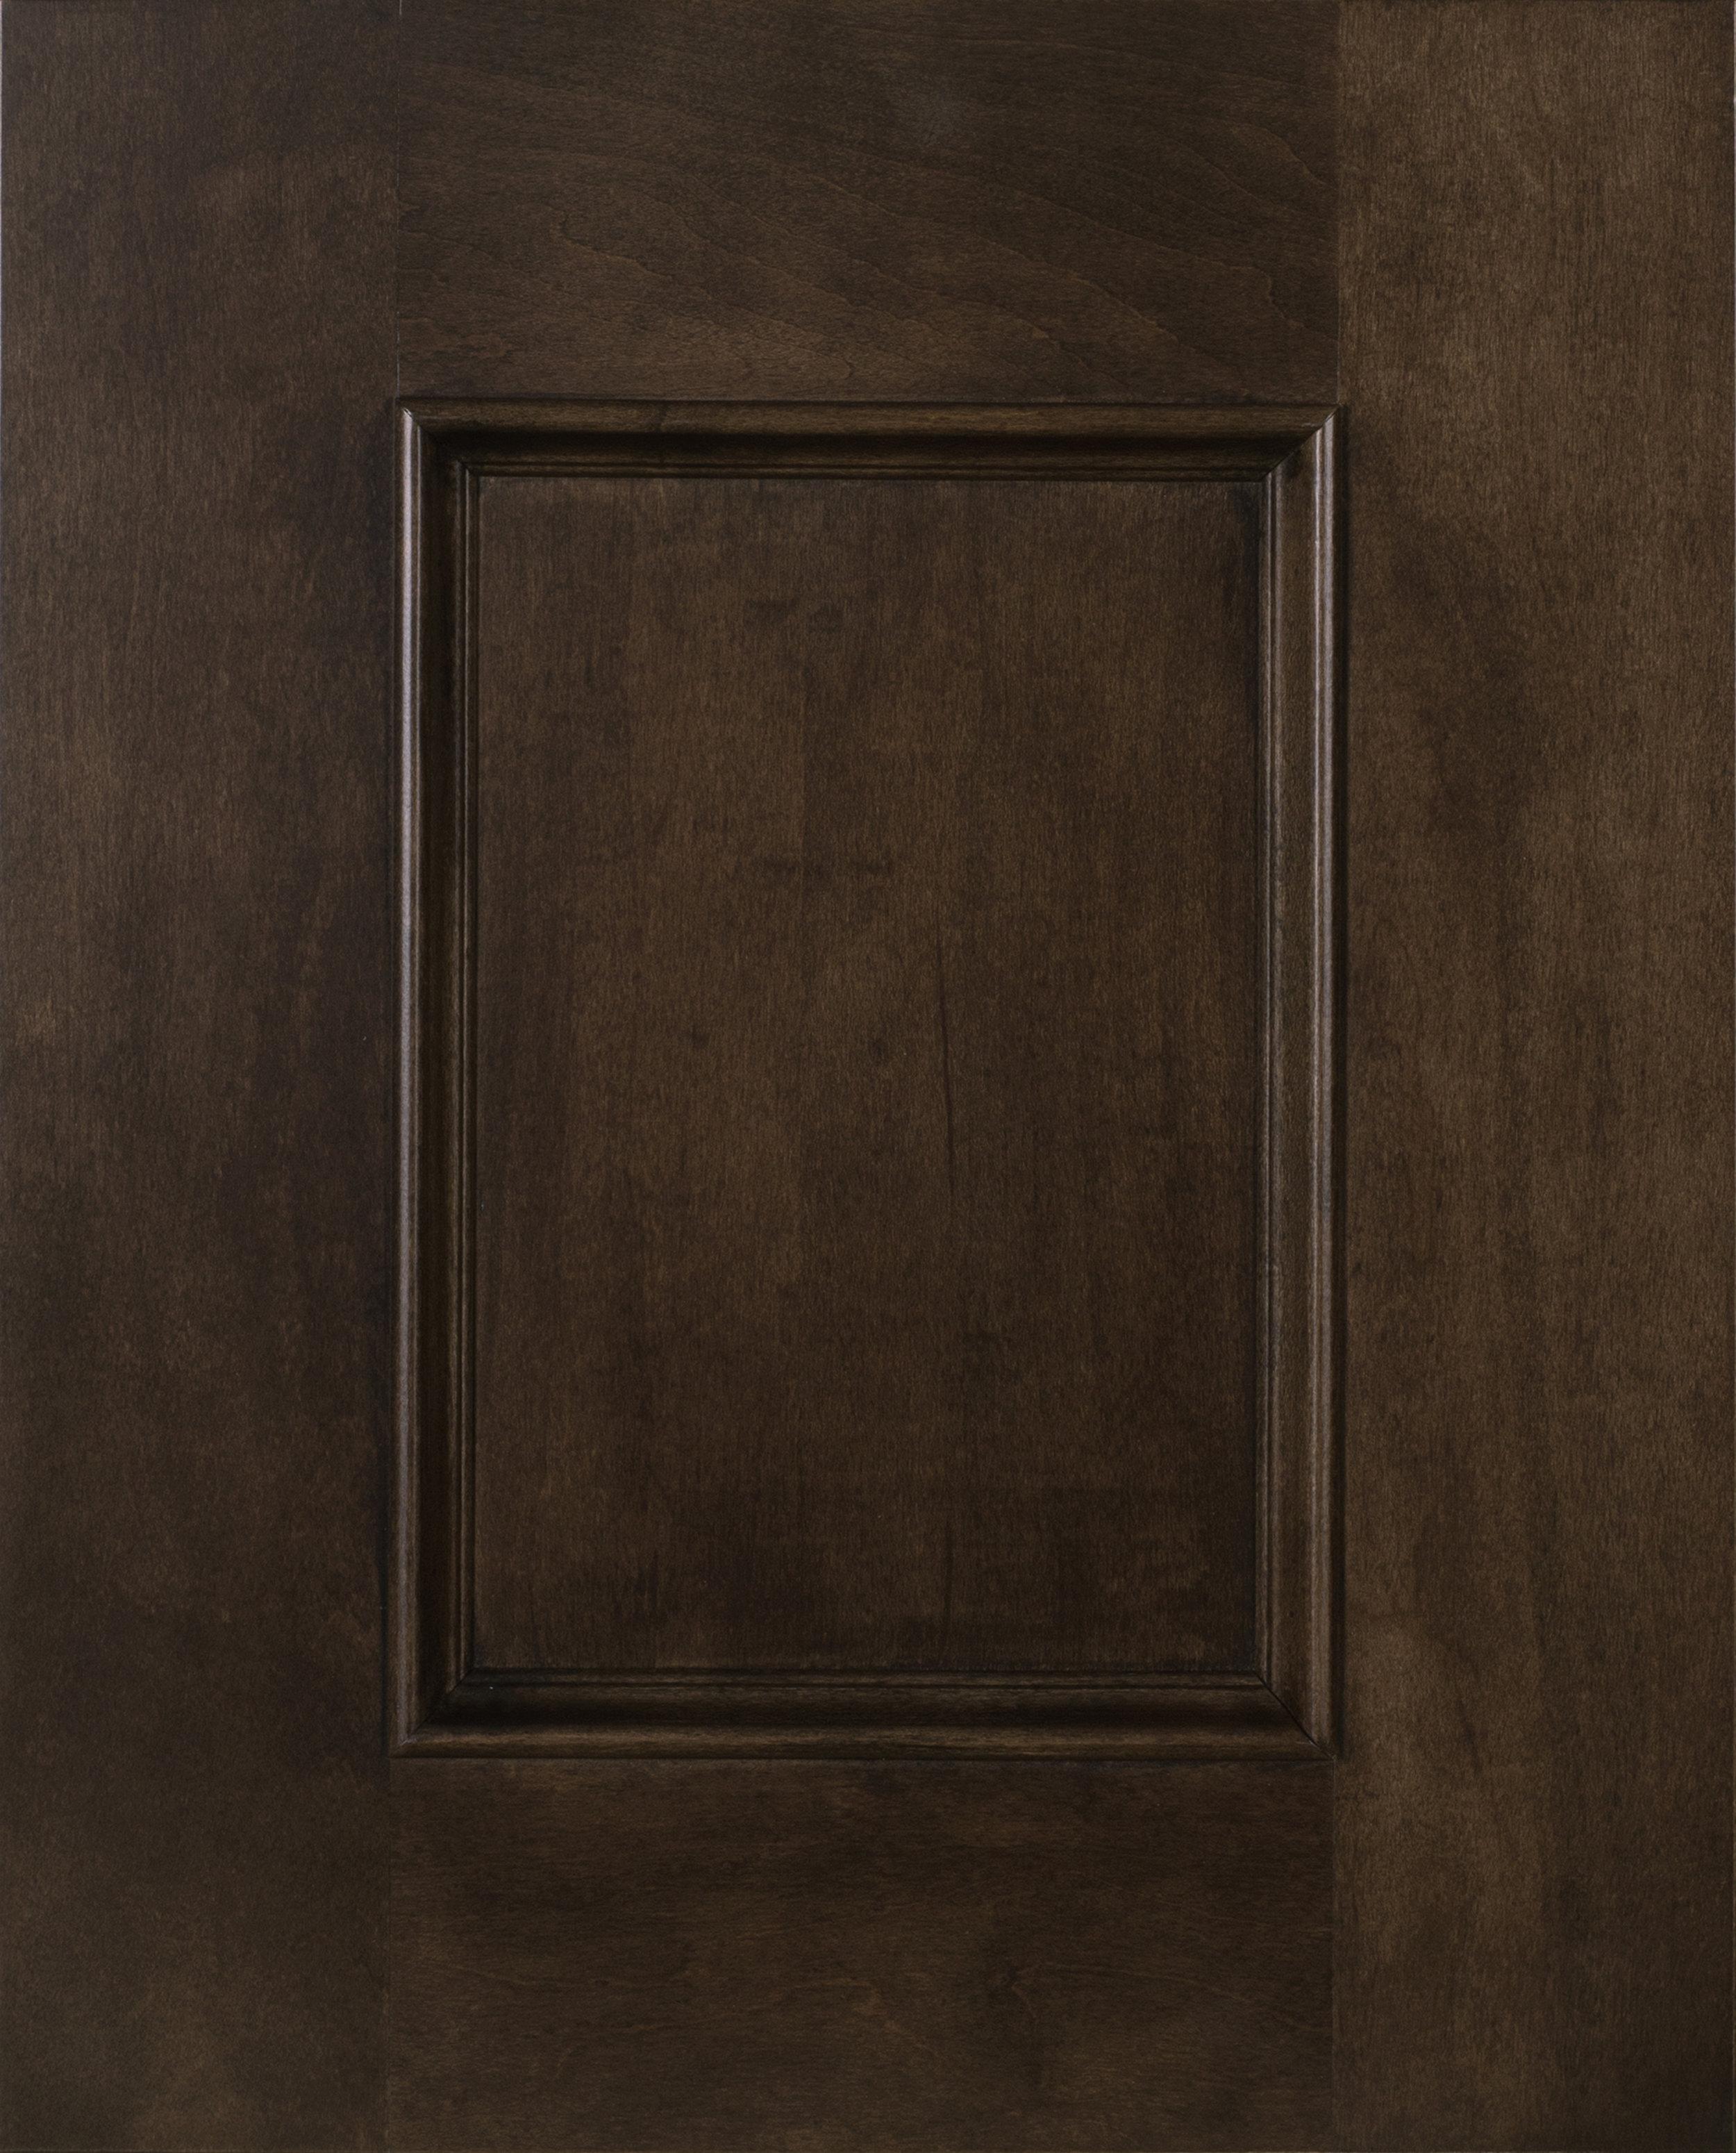 "Rainier - Recessed 1/4"" Center PanelCherry | Maple | Paint | Rustic BeechShown in Maple Mocha"